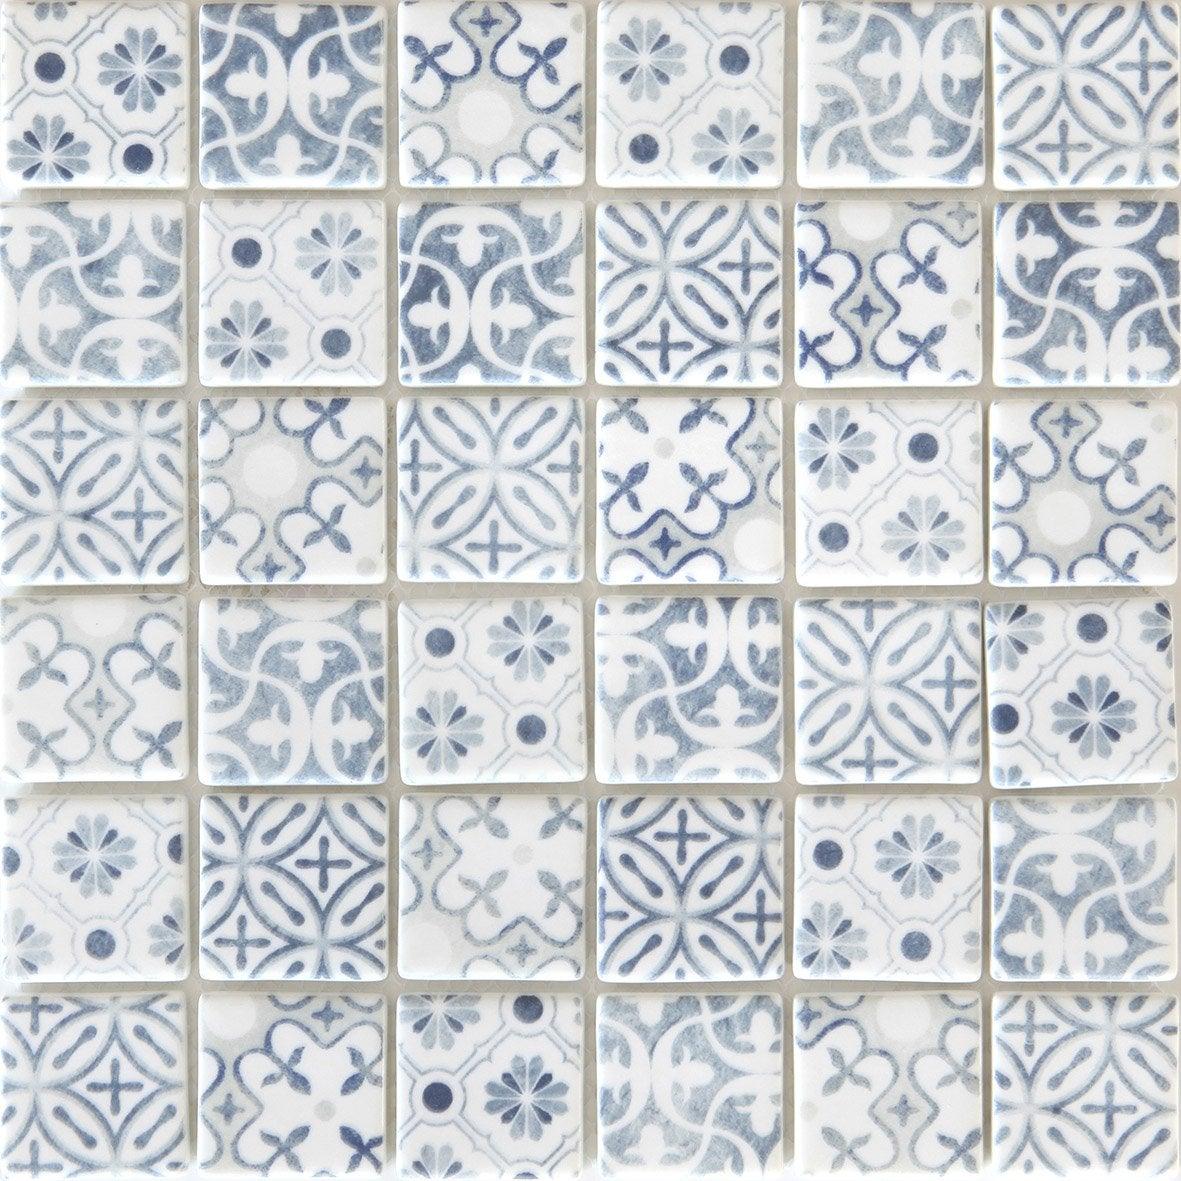 Mosaïque mur Graphik cement bleu gris